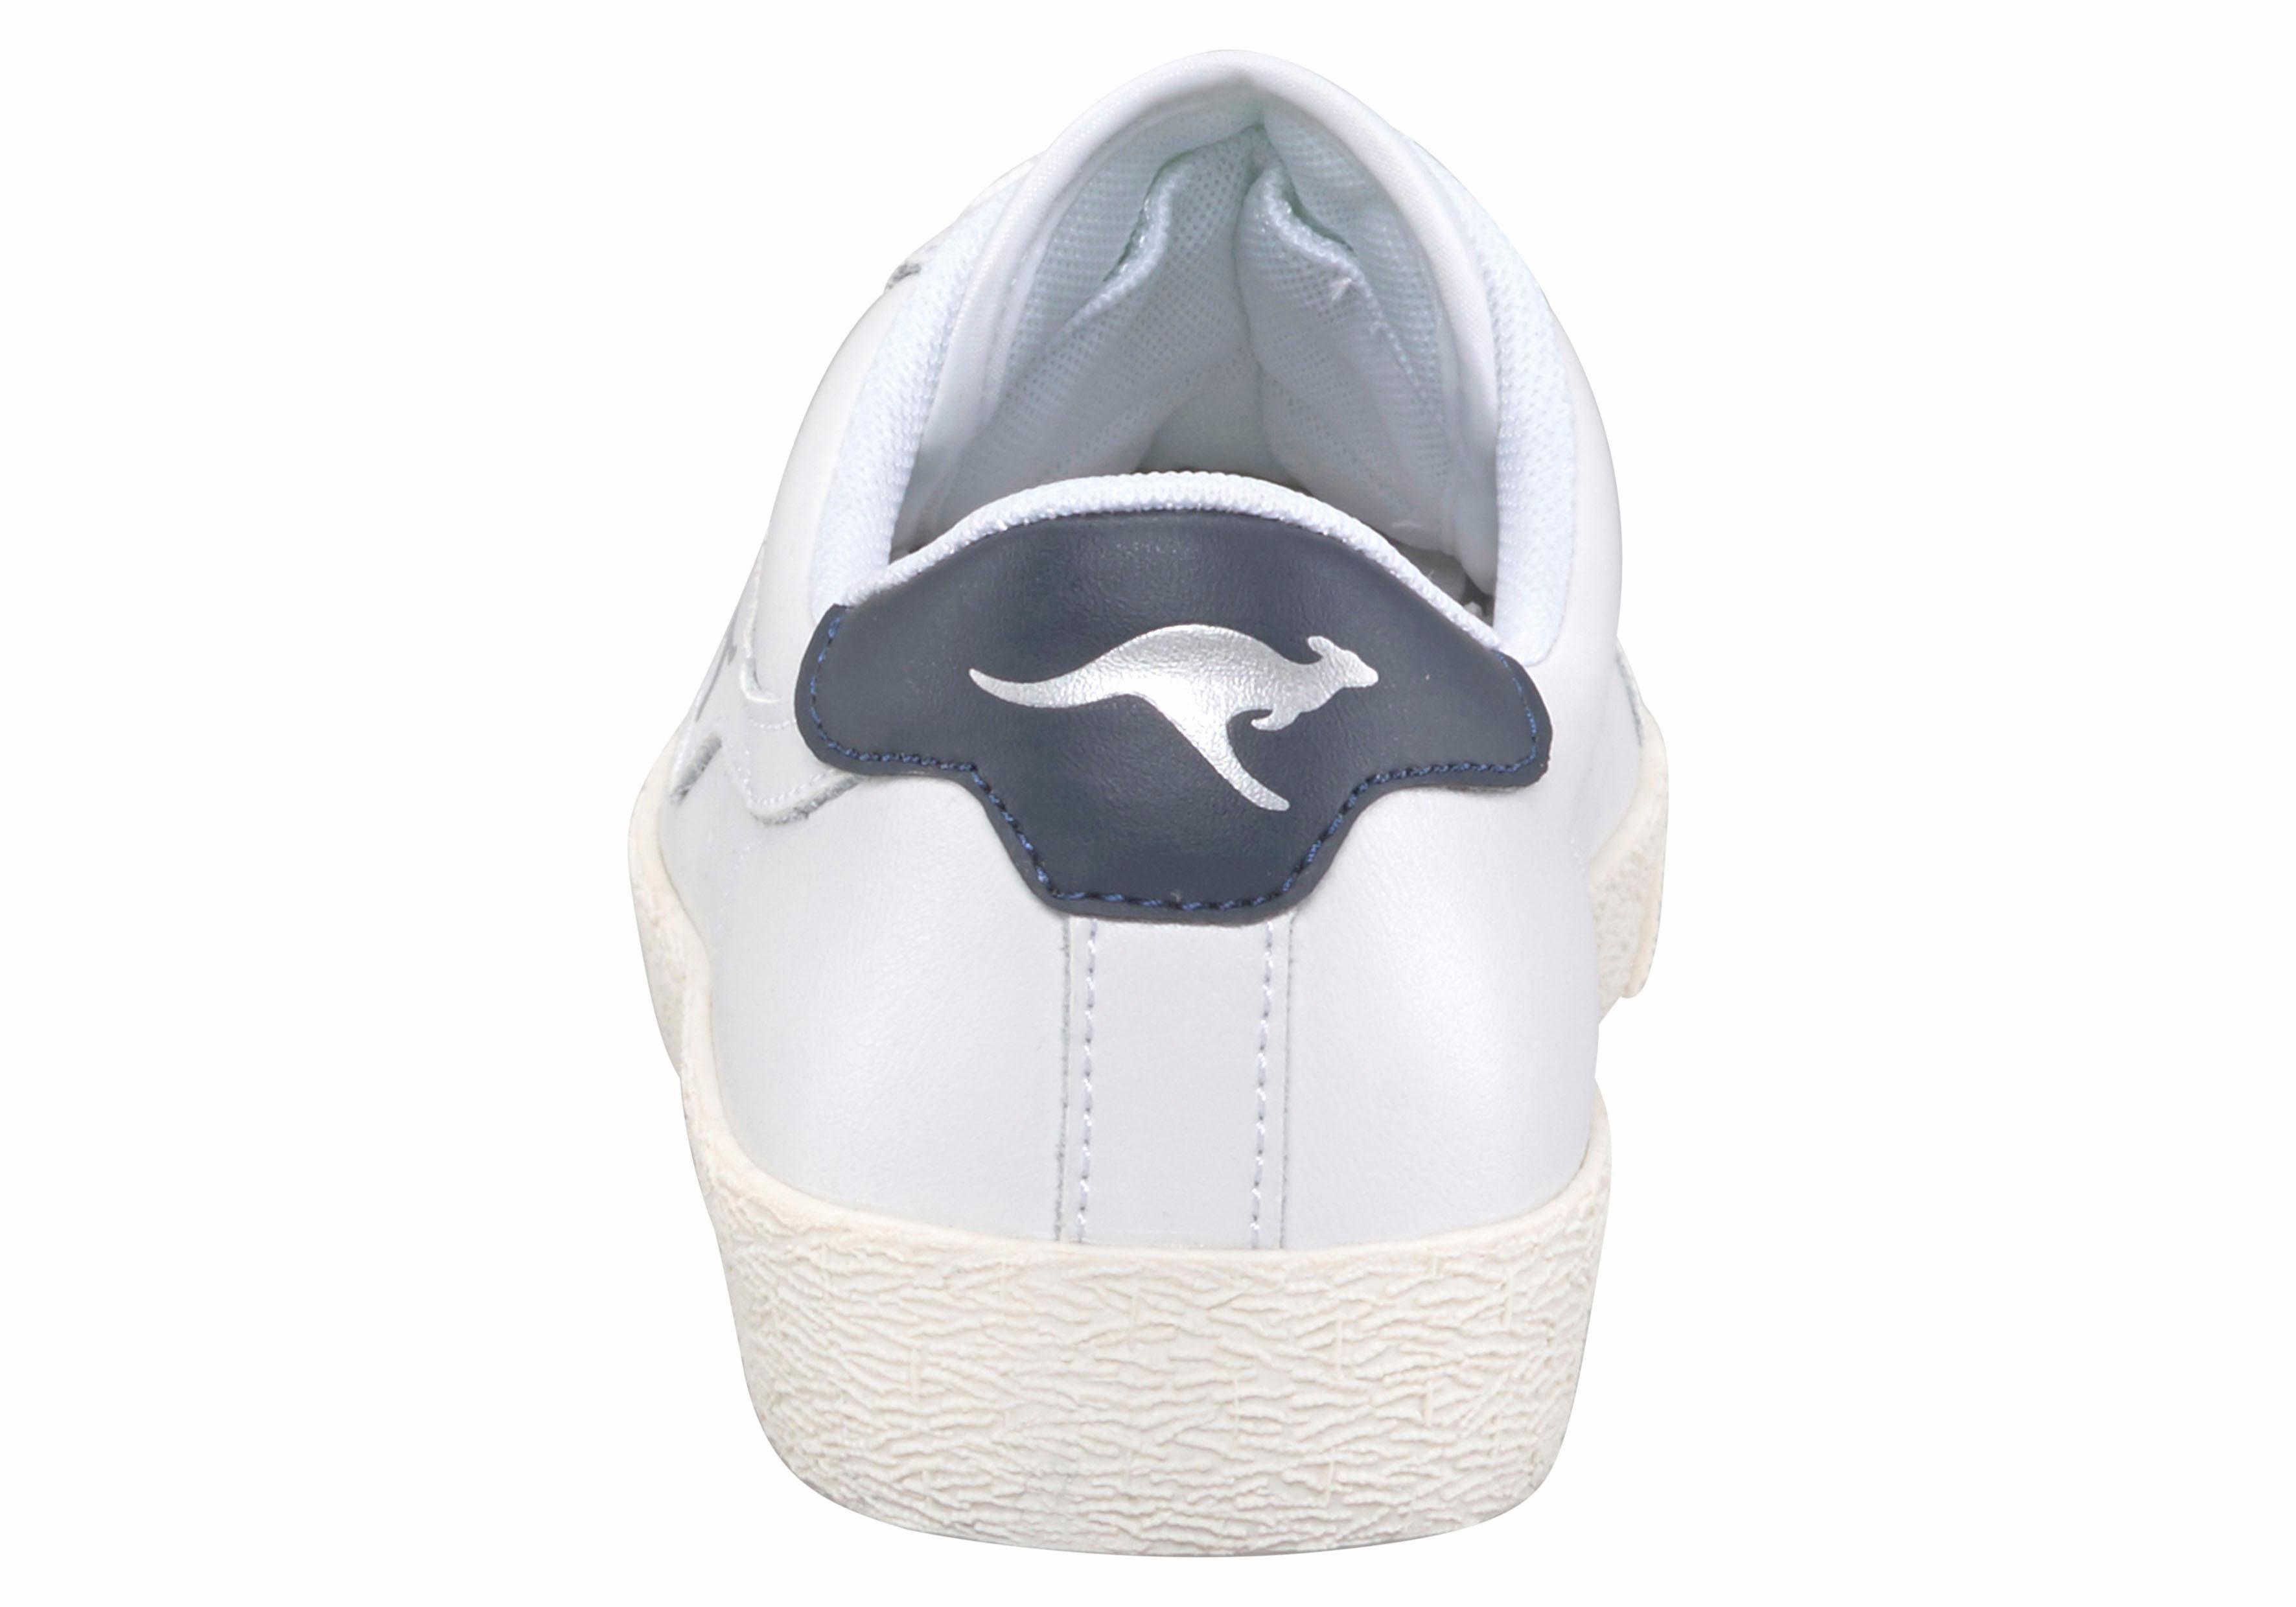 KangaROOS Chako Sneaker online kaufen  weiß-blau